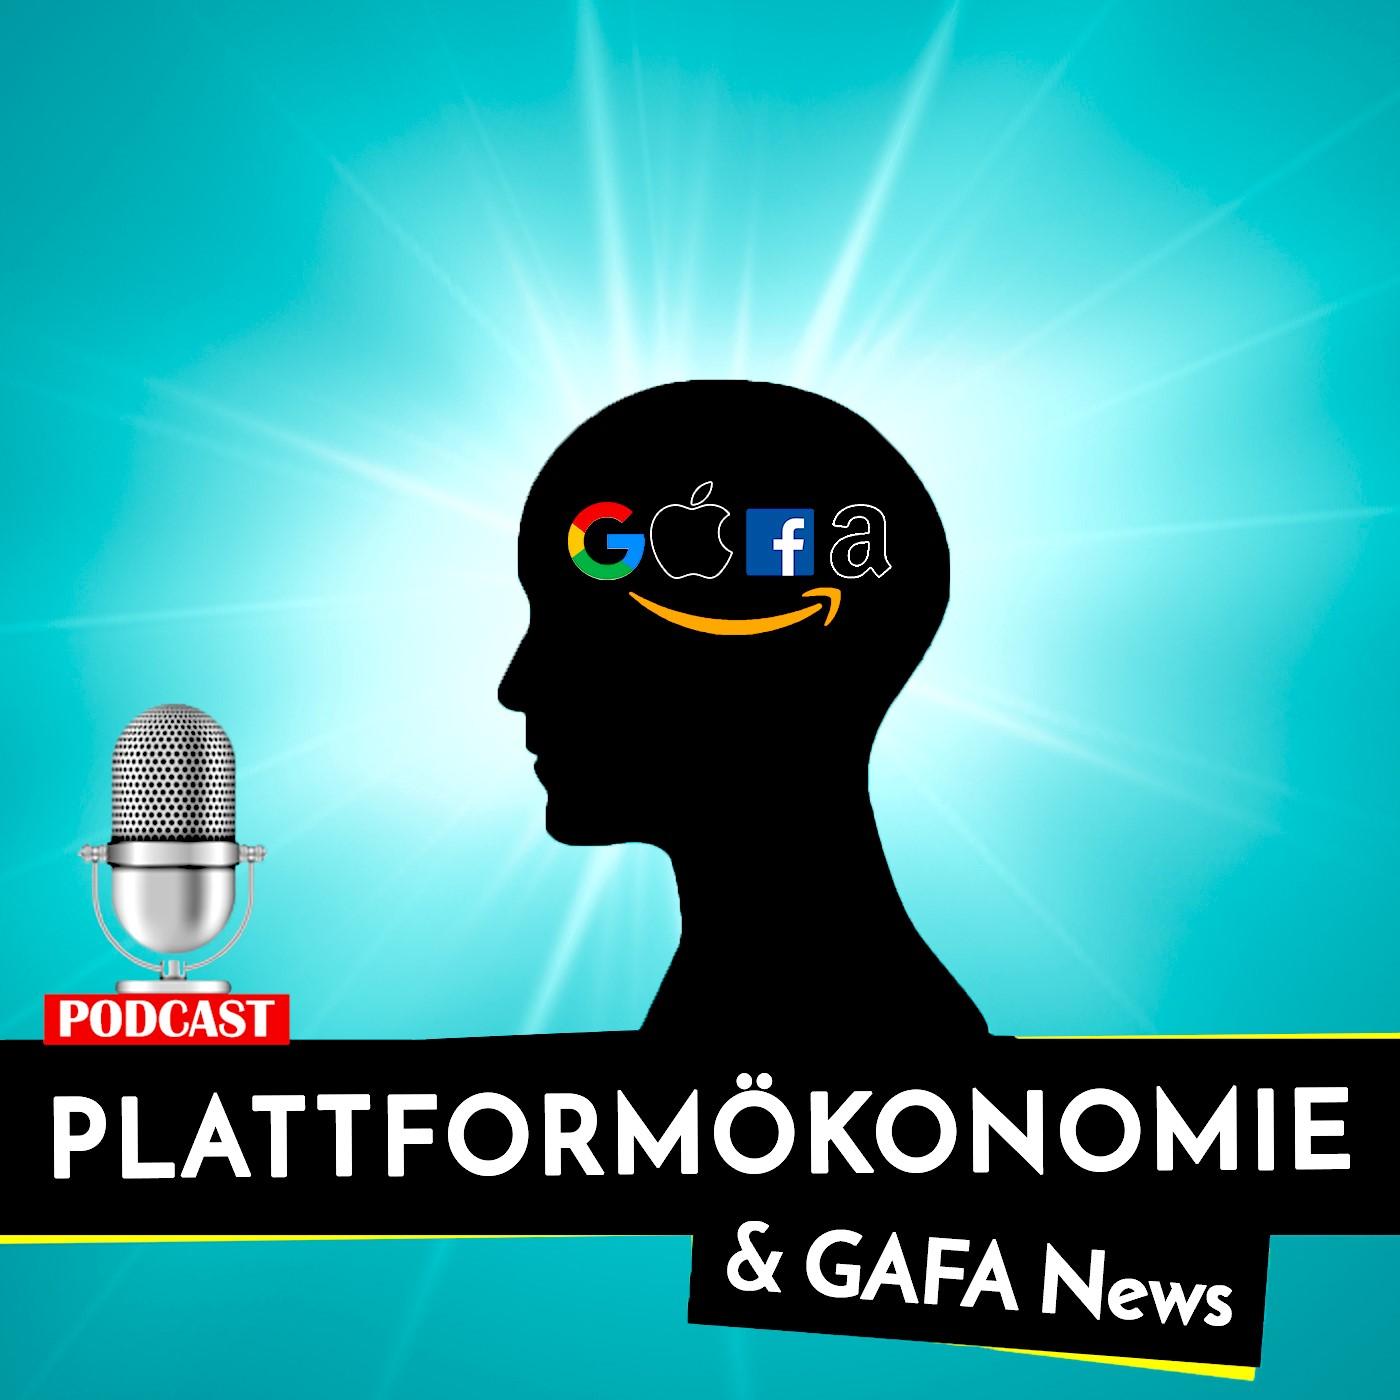 Wöchentliche Startup News | Digitale Nachrichten | Heute u.a: IKEA, Youtube, Bonavi, Elon Musk, Barclaycard